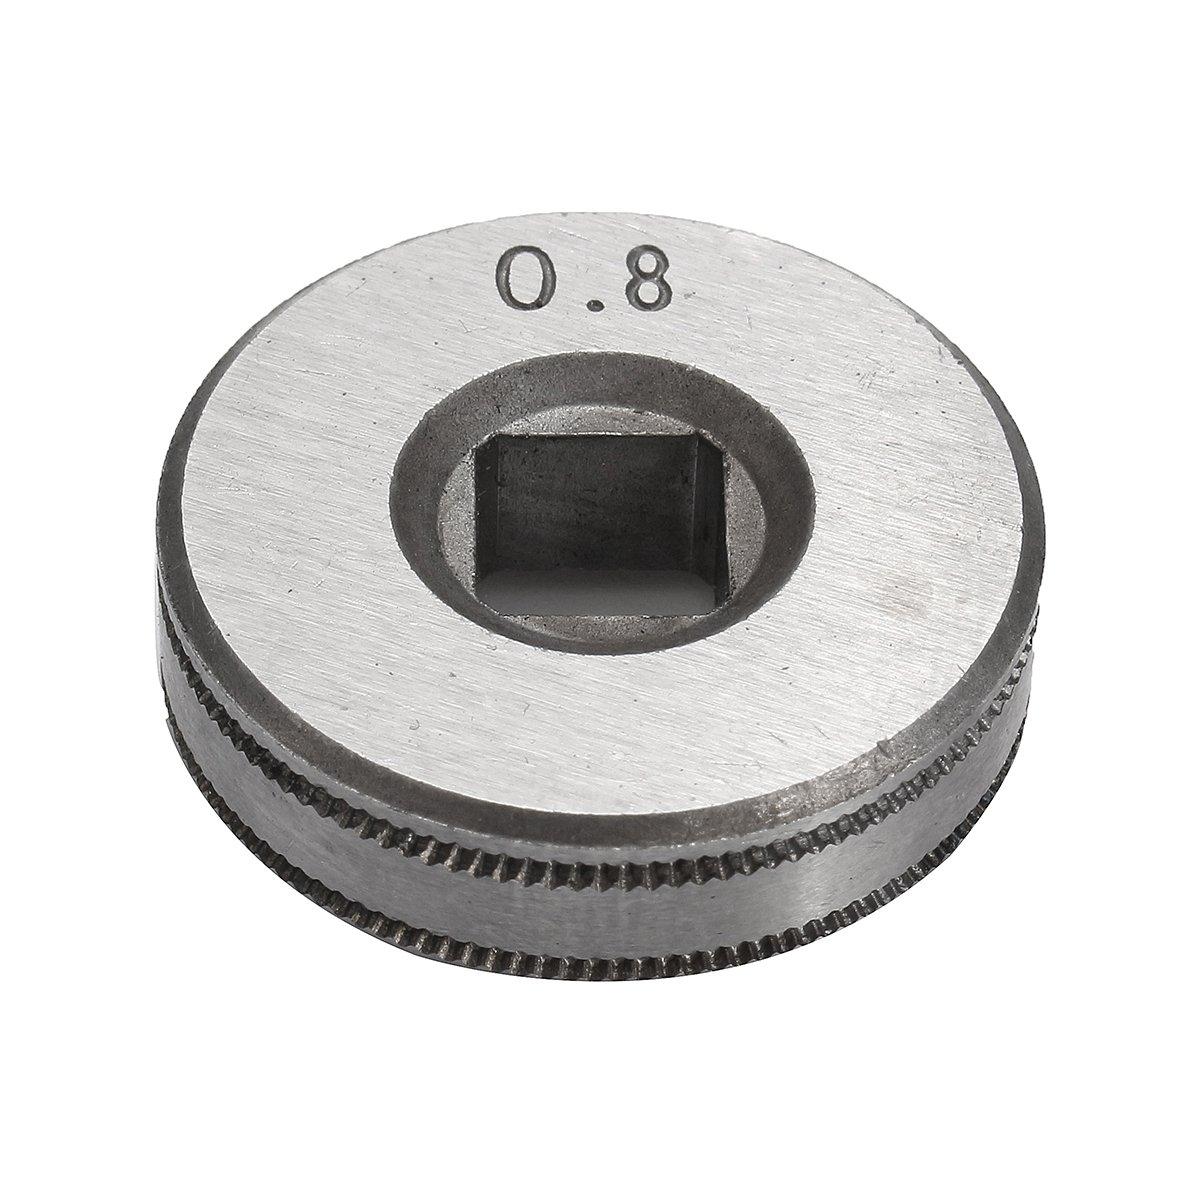 Pukido MIG Welding Steel 0.6-0.8 Wire Feed Drive Roller Roll Part Welding Machine Accessories